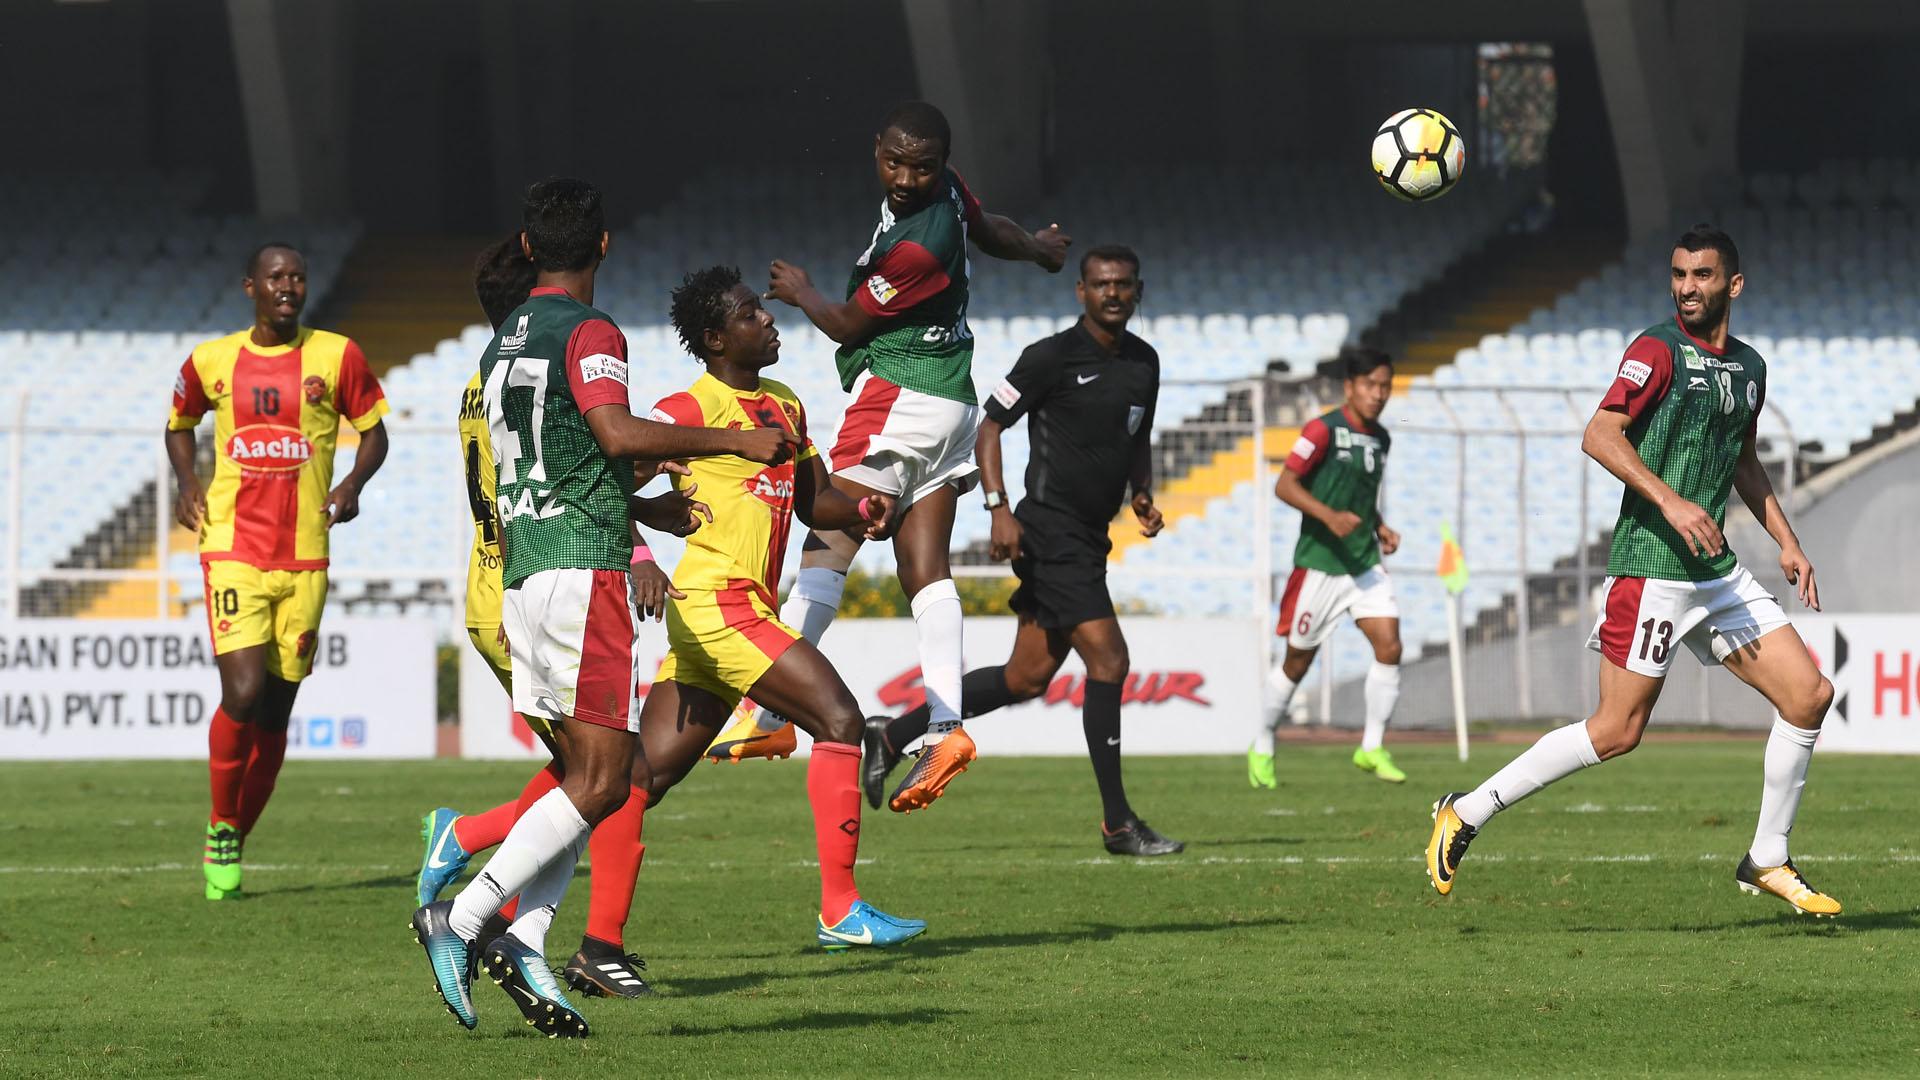 Mohun Bagan Gokulam FC I-League 2017/2018